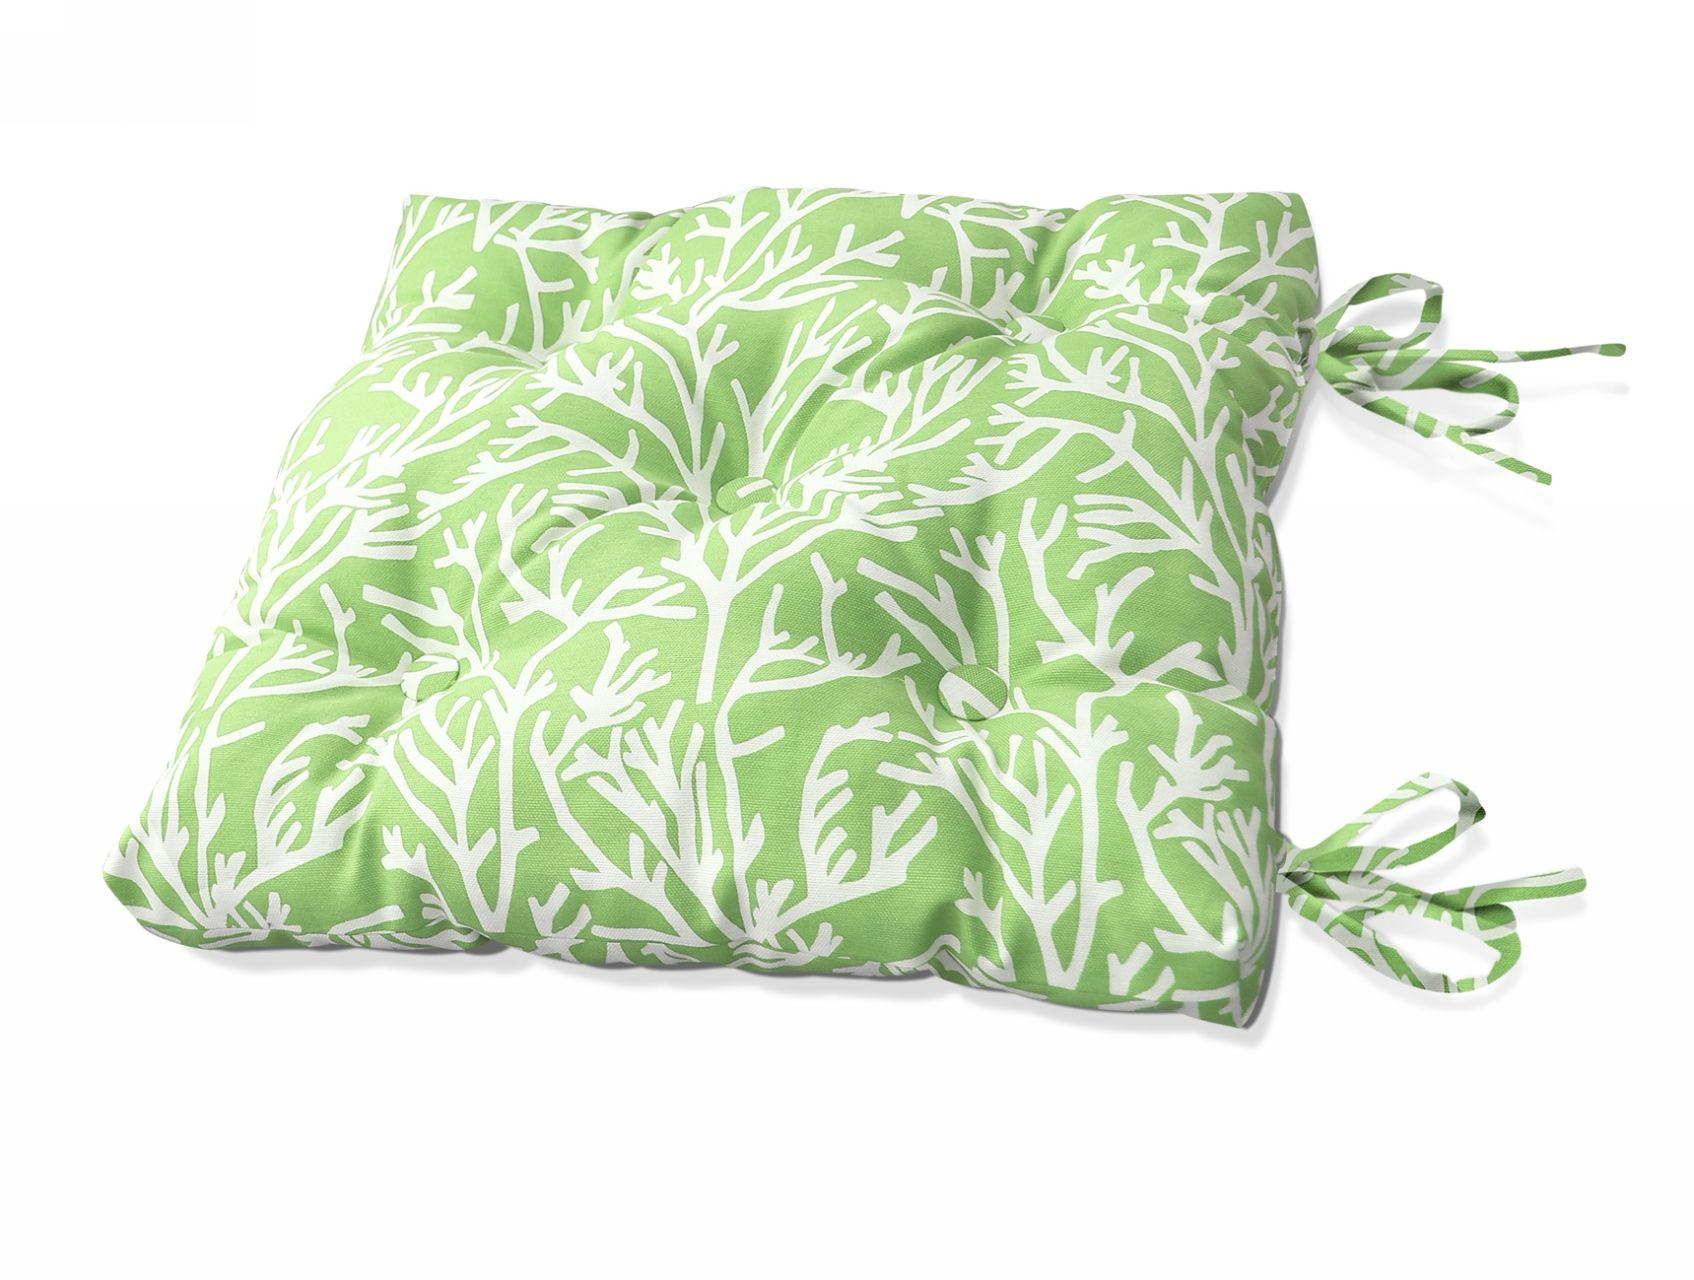 купить Подушки на стул Kauffort Подушка на стул Corals - S Цвет: Зеленый (50х50) по цене 1190 рублей